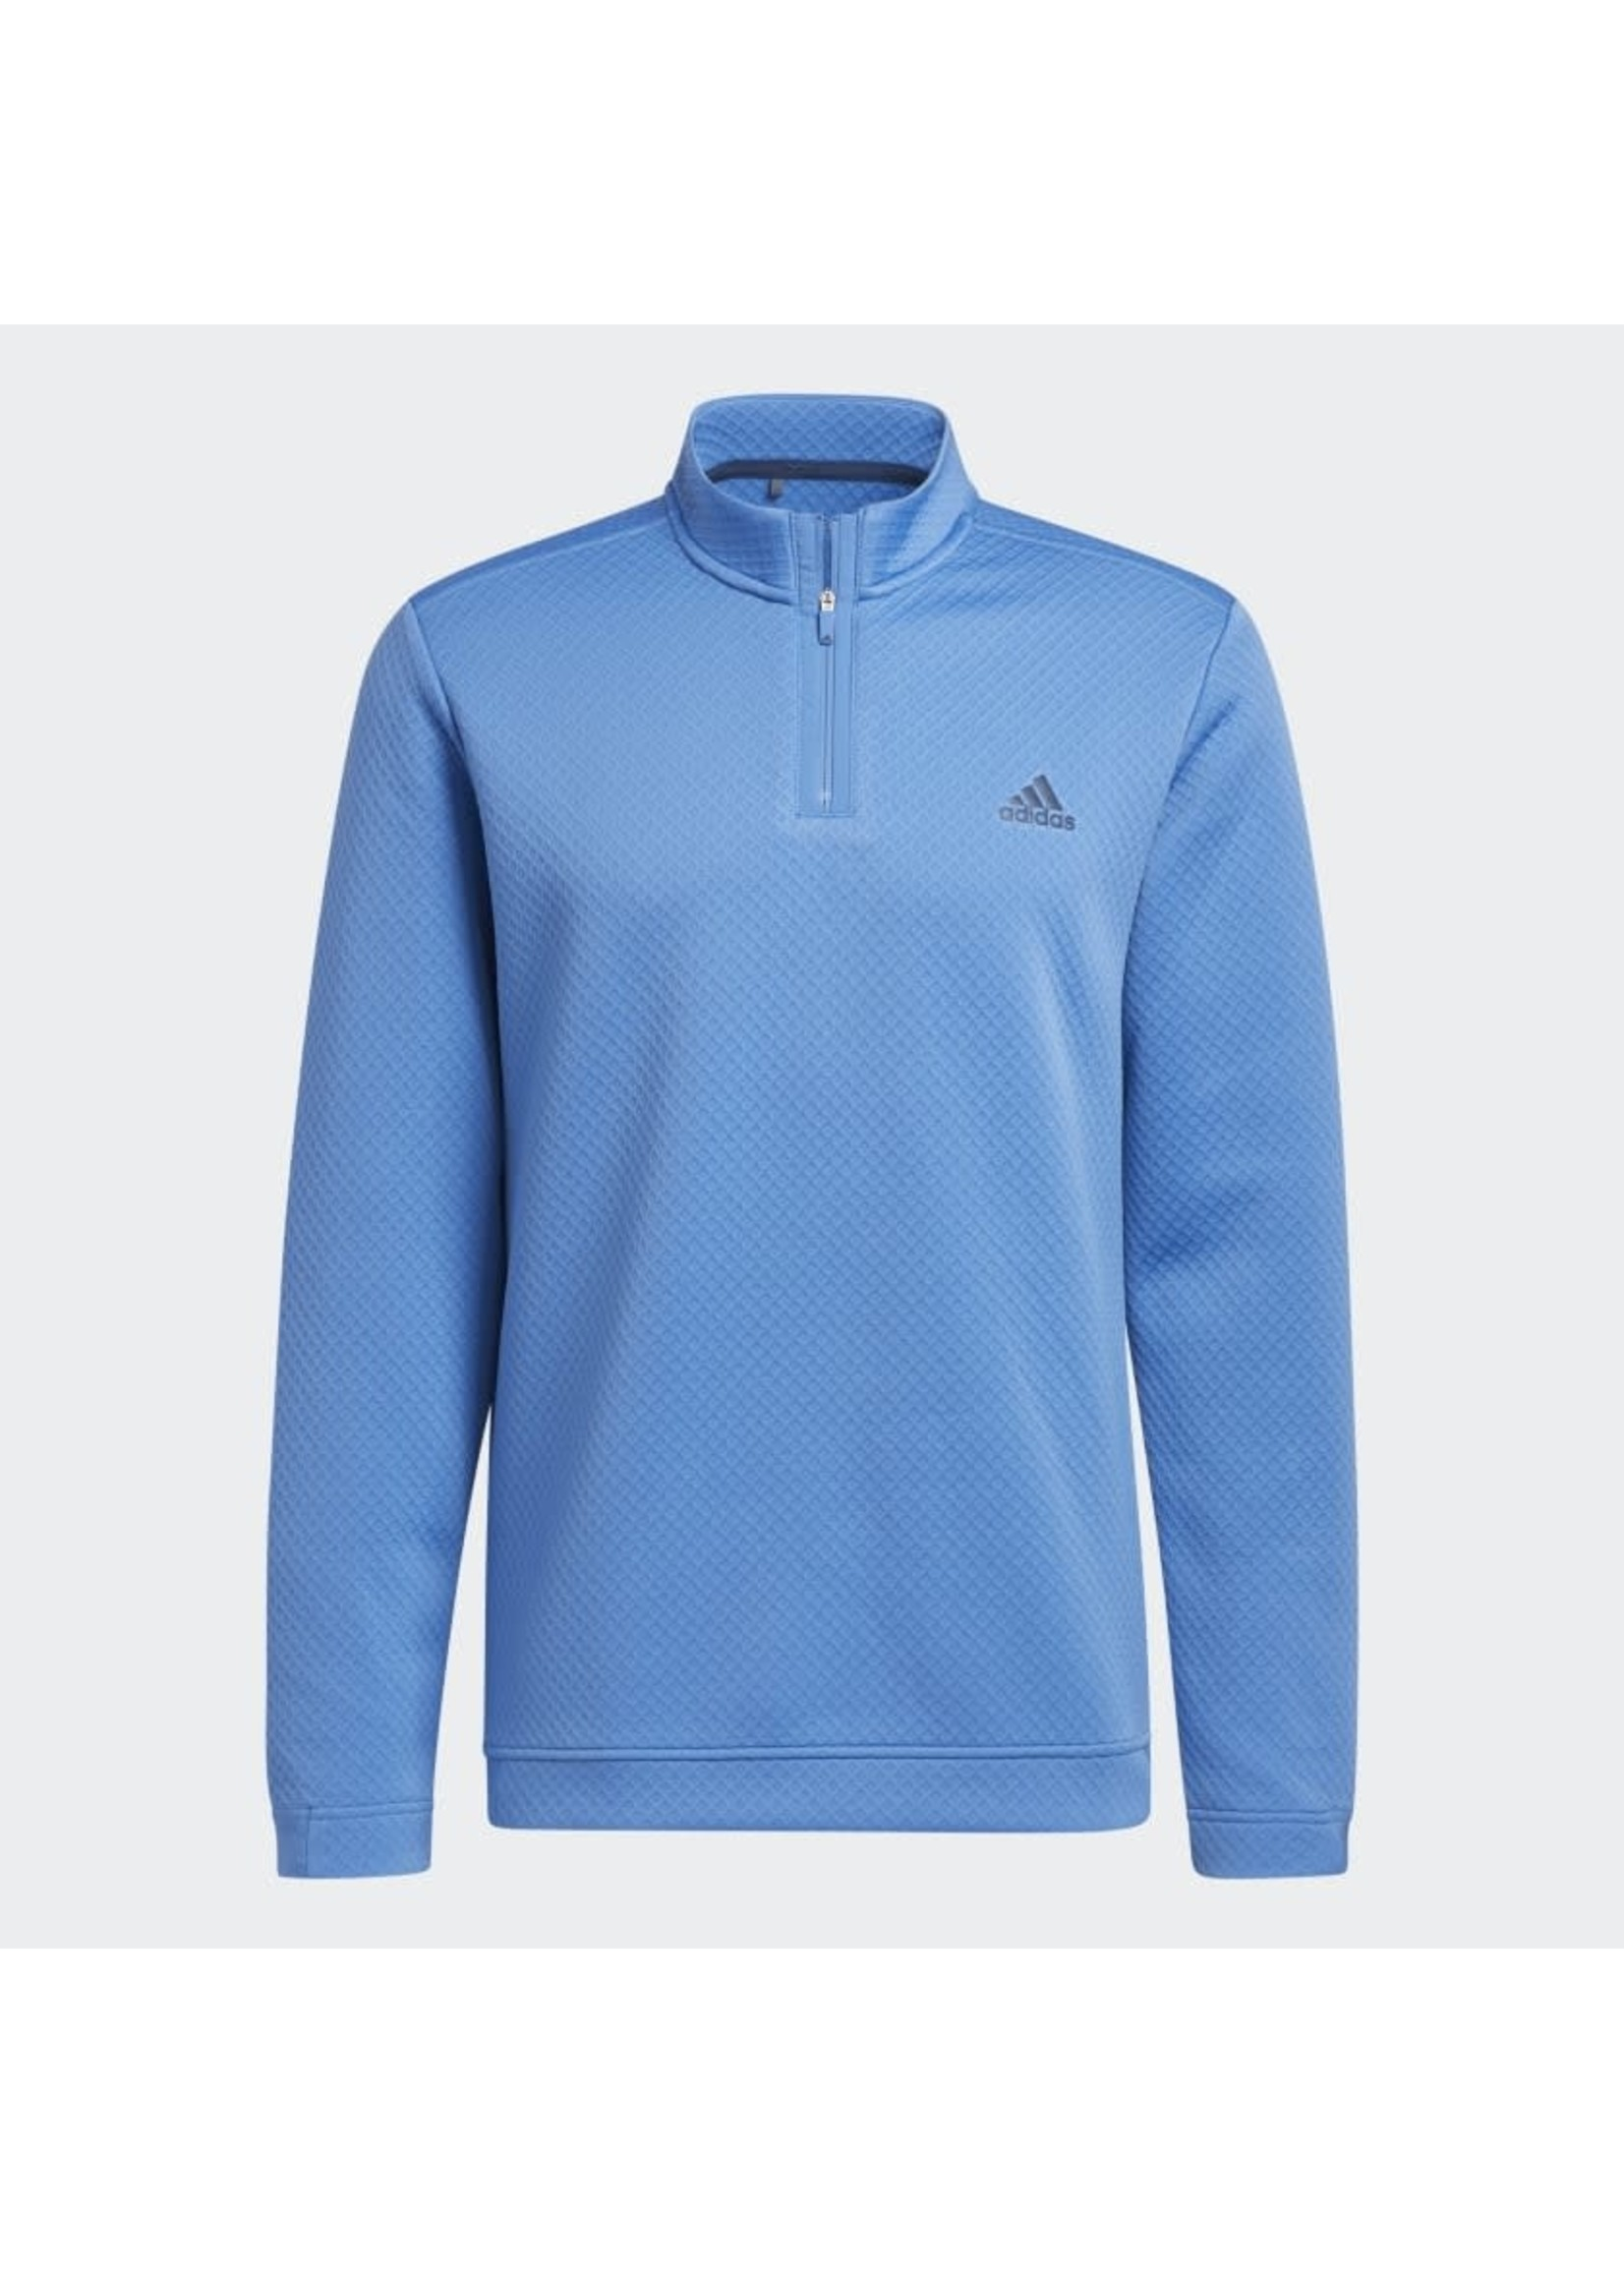 Adidas Adidas Prime Green Water Resistant Mens Golf Top (2021) - Focus Blue